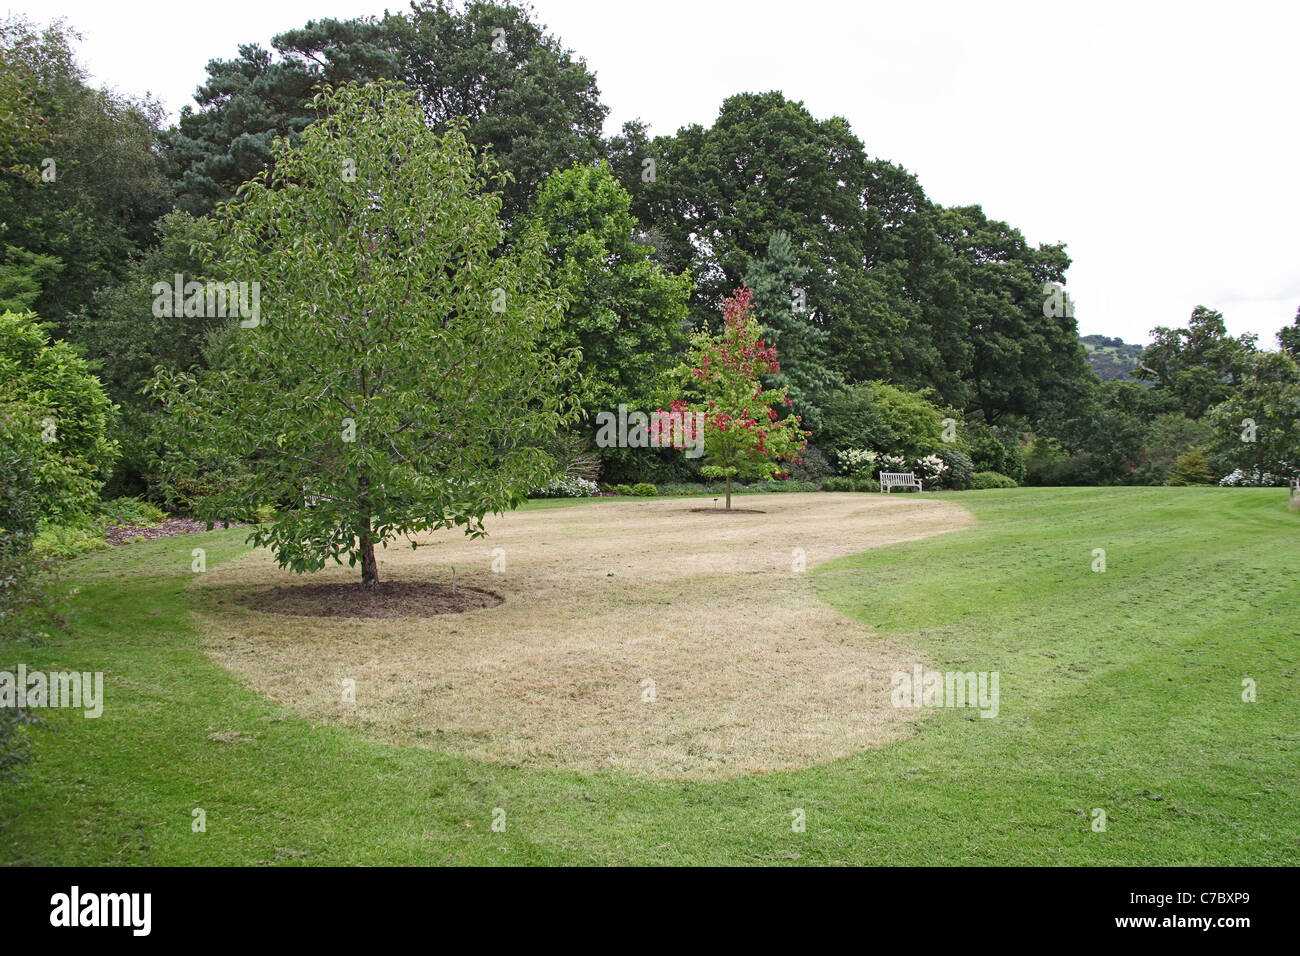 La fin de la tonte de l'illustre domaine de bulbes en lawn Garden Rosemoor Royal Horticultural Society, Great Torrington, Devon, England, UK Banque D'Images